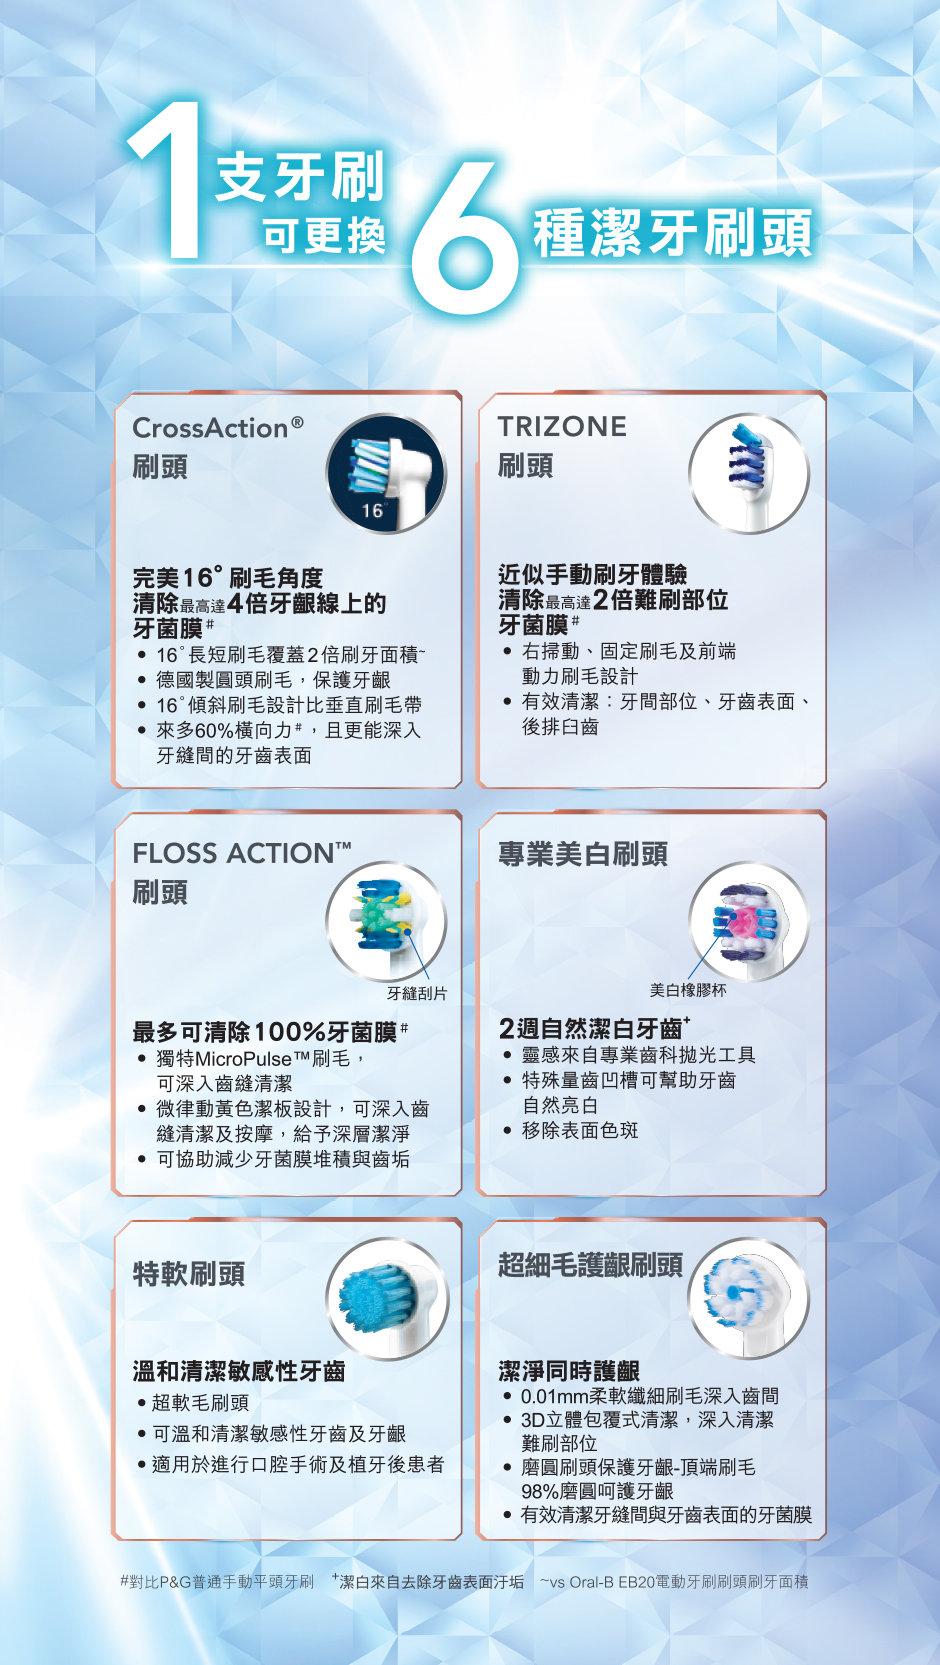 Oral B | EB20 Brush Head (Precision Clean) | HKTVmall Online Shopping